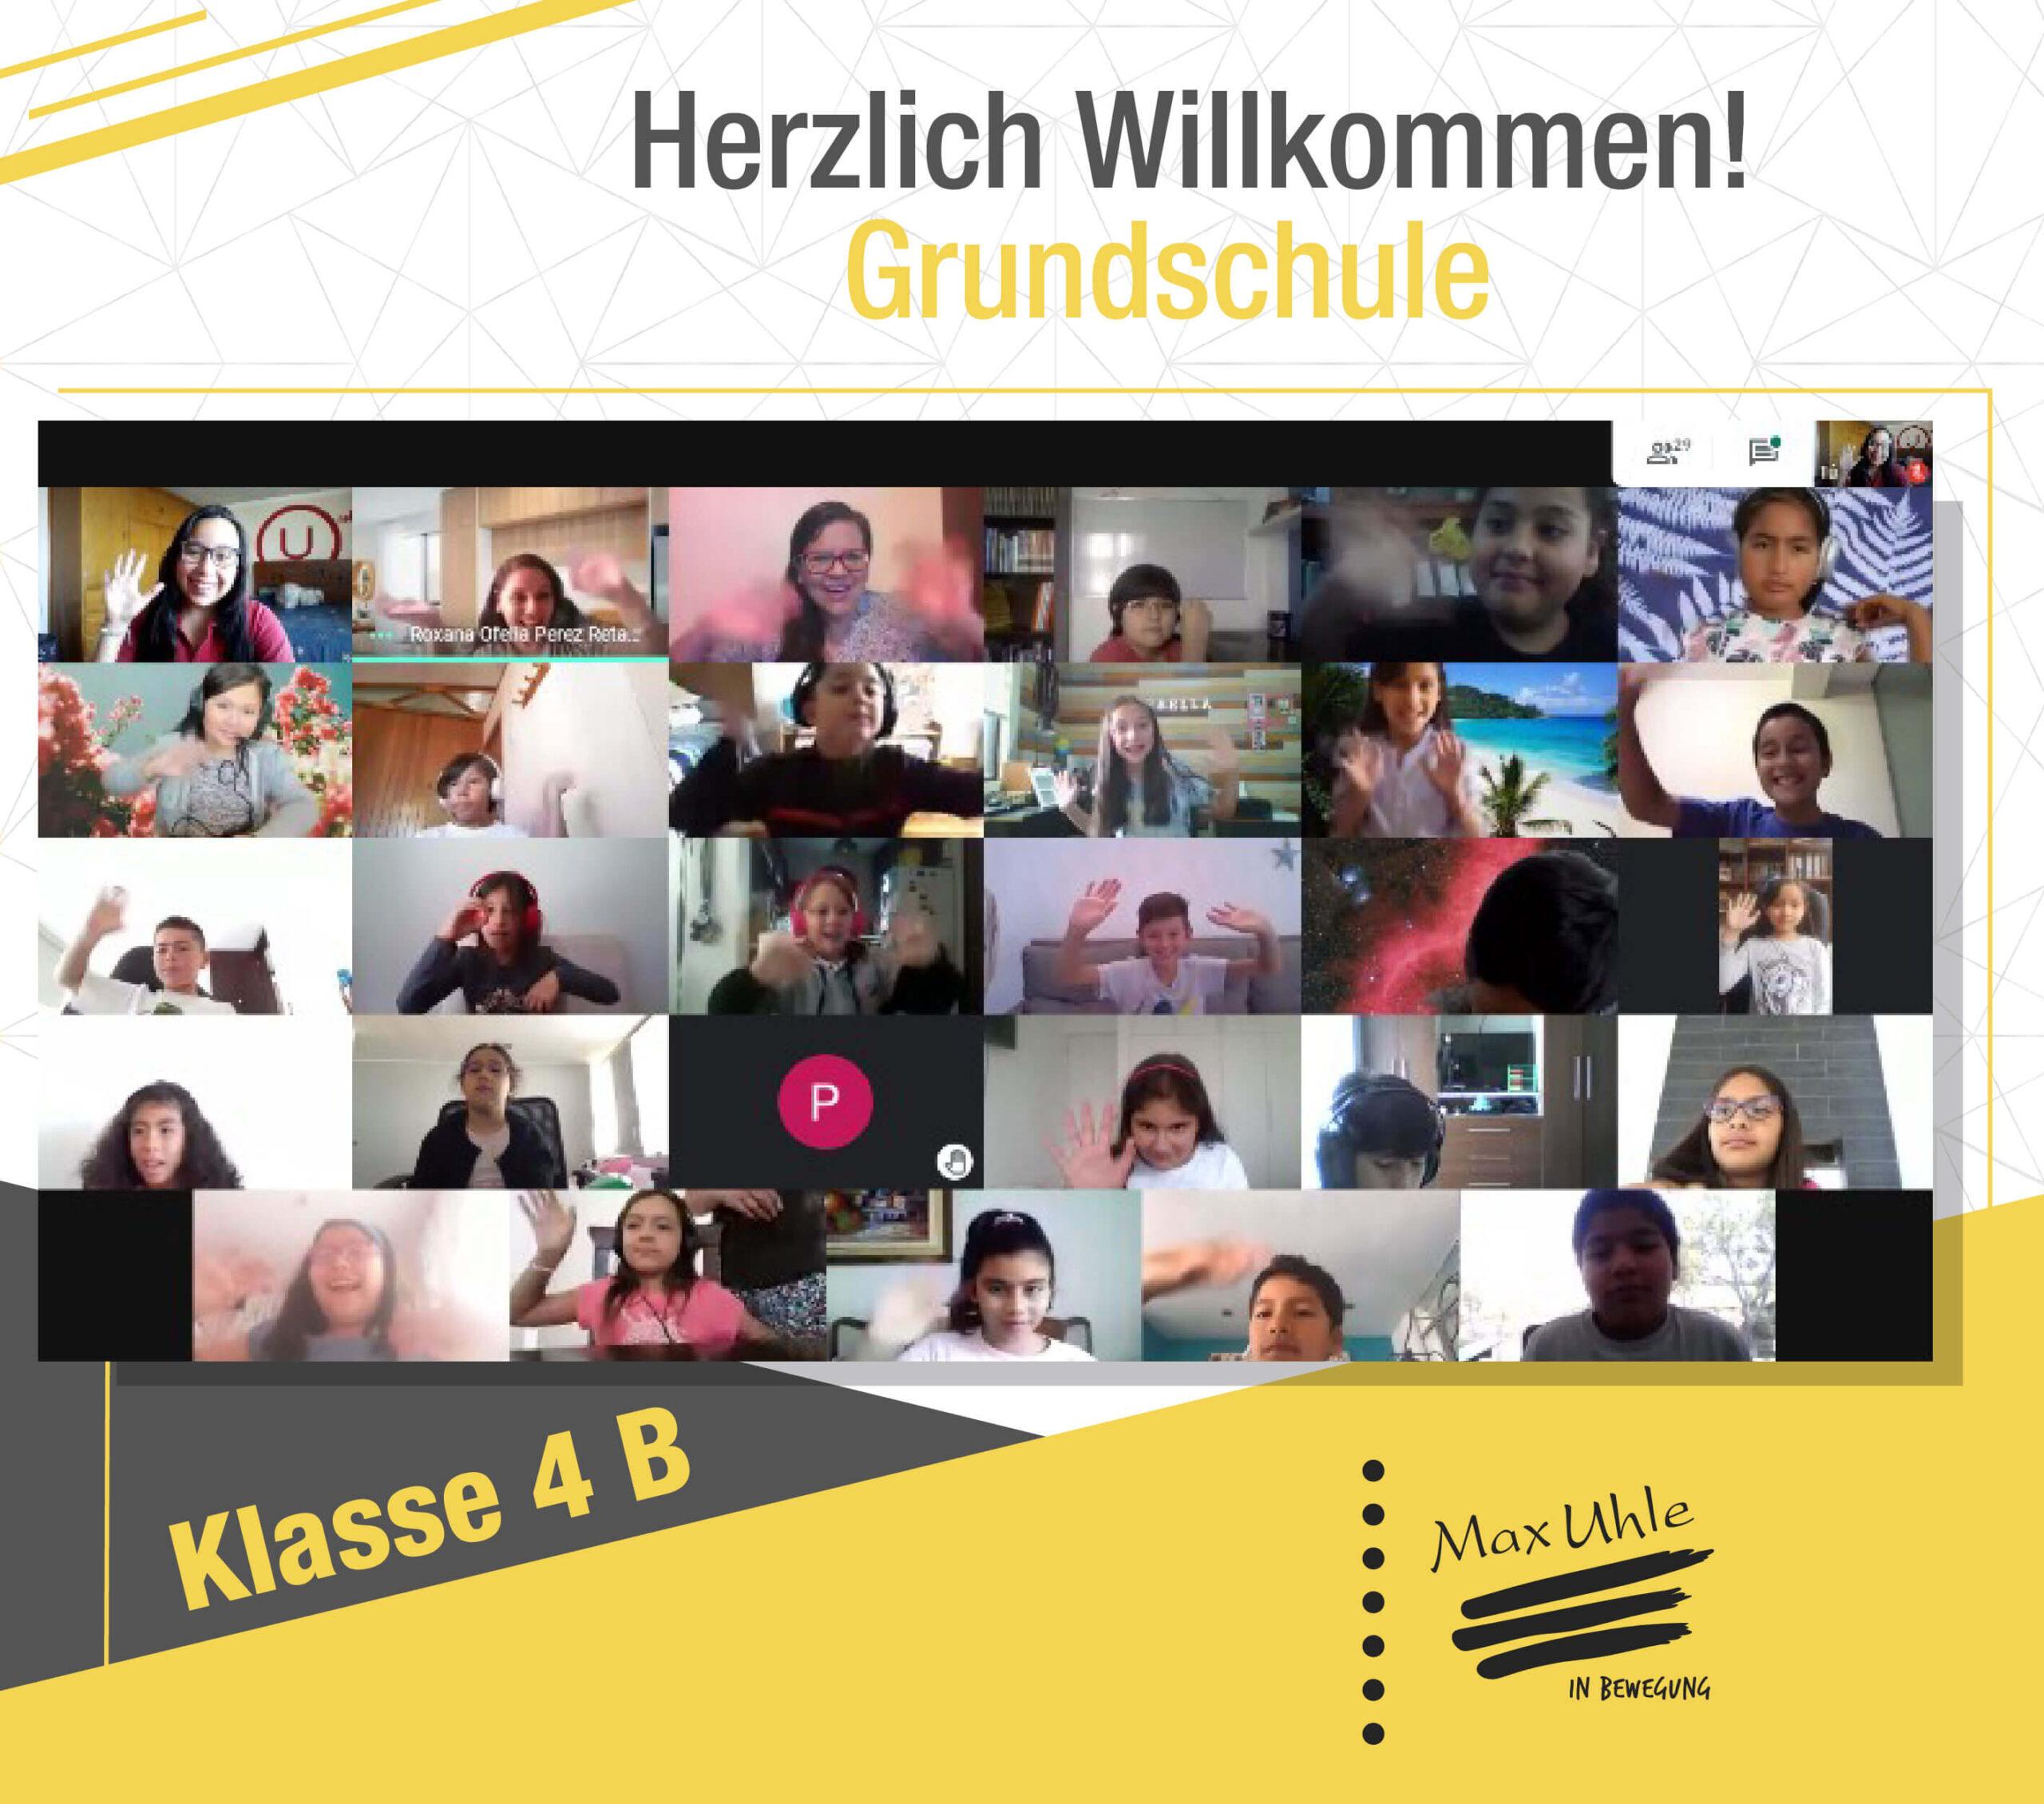 regreso a clases 2021 Grundschule 4B